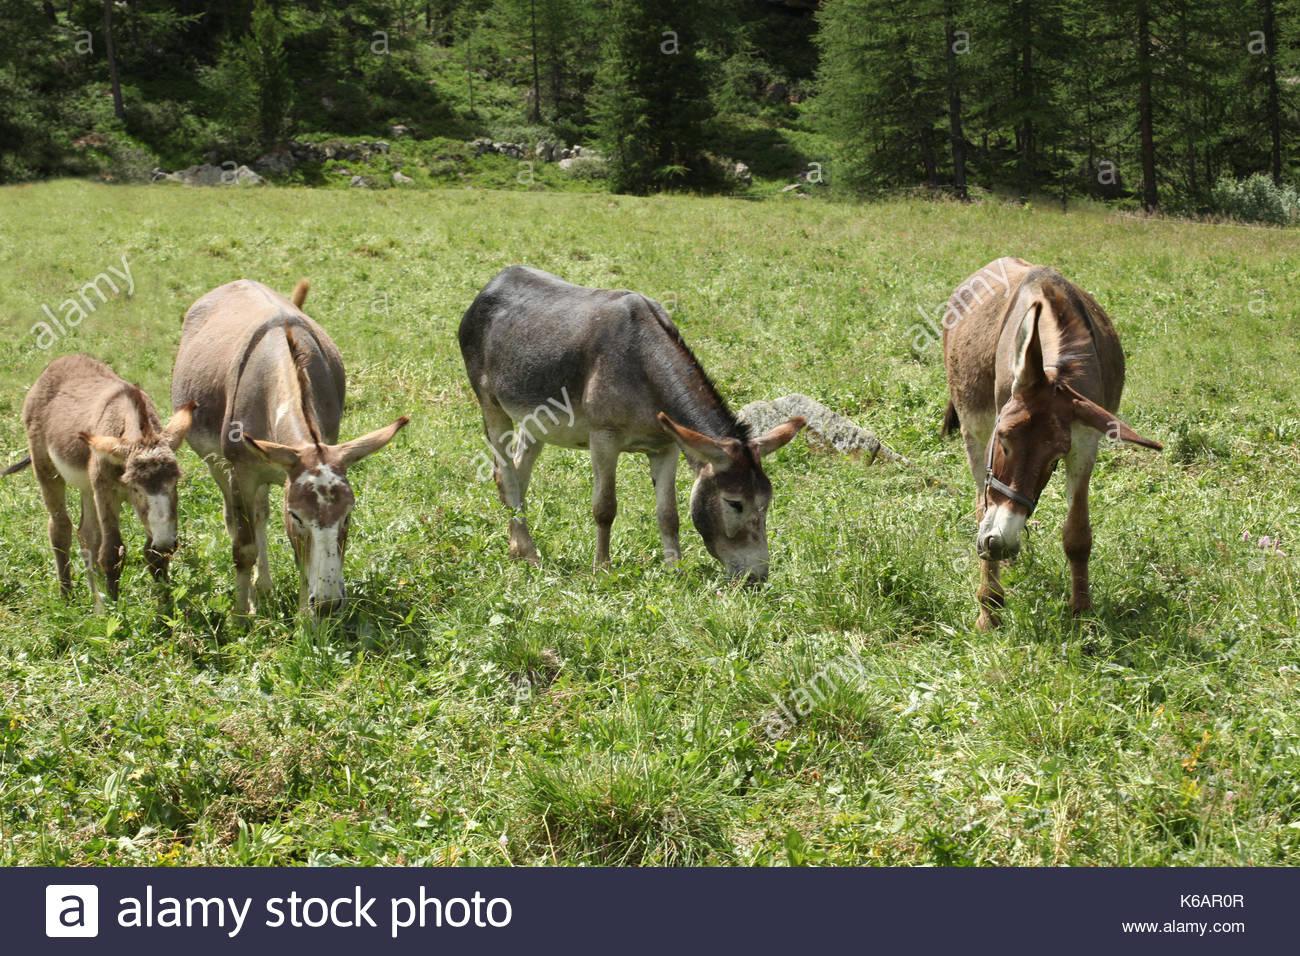 five donkeys on a meadow in italian alps valle d'aosta - Stock Image